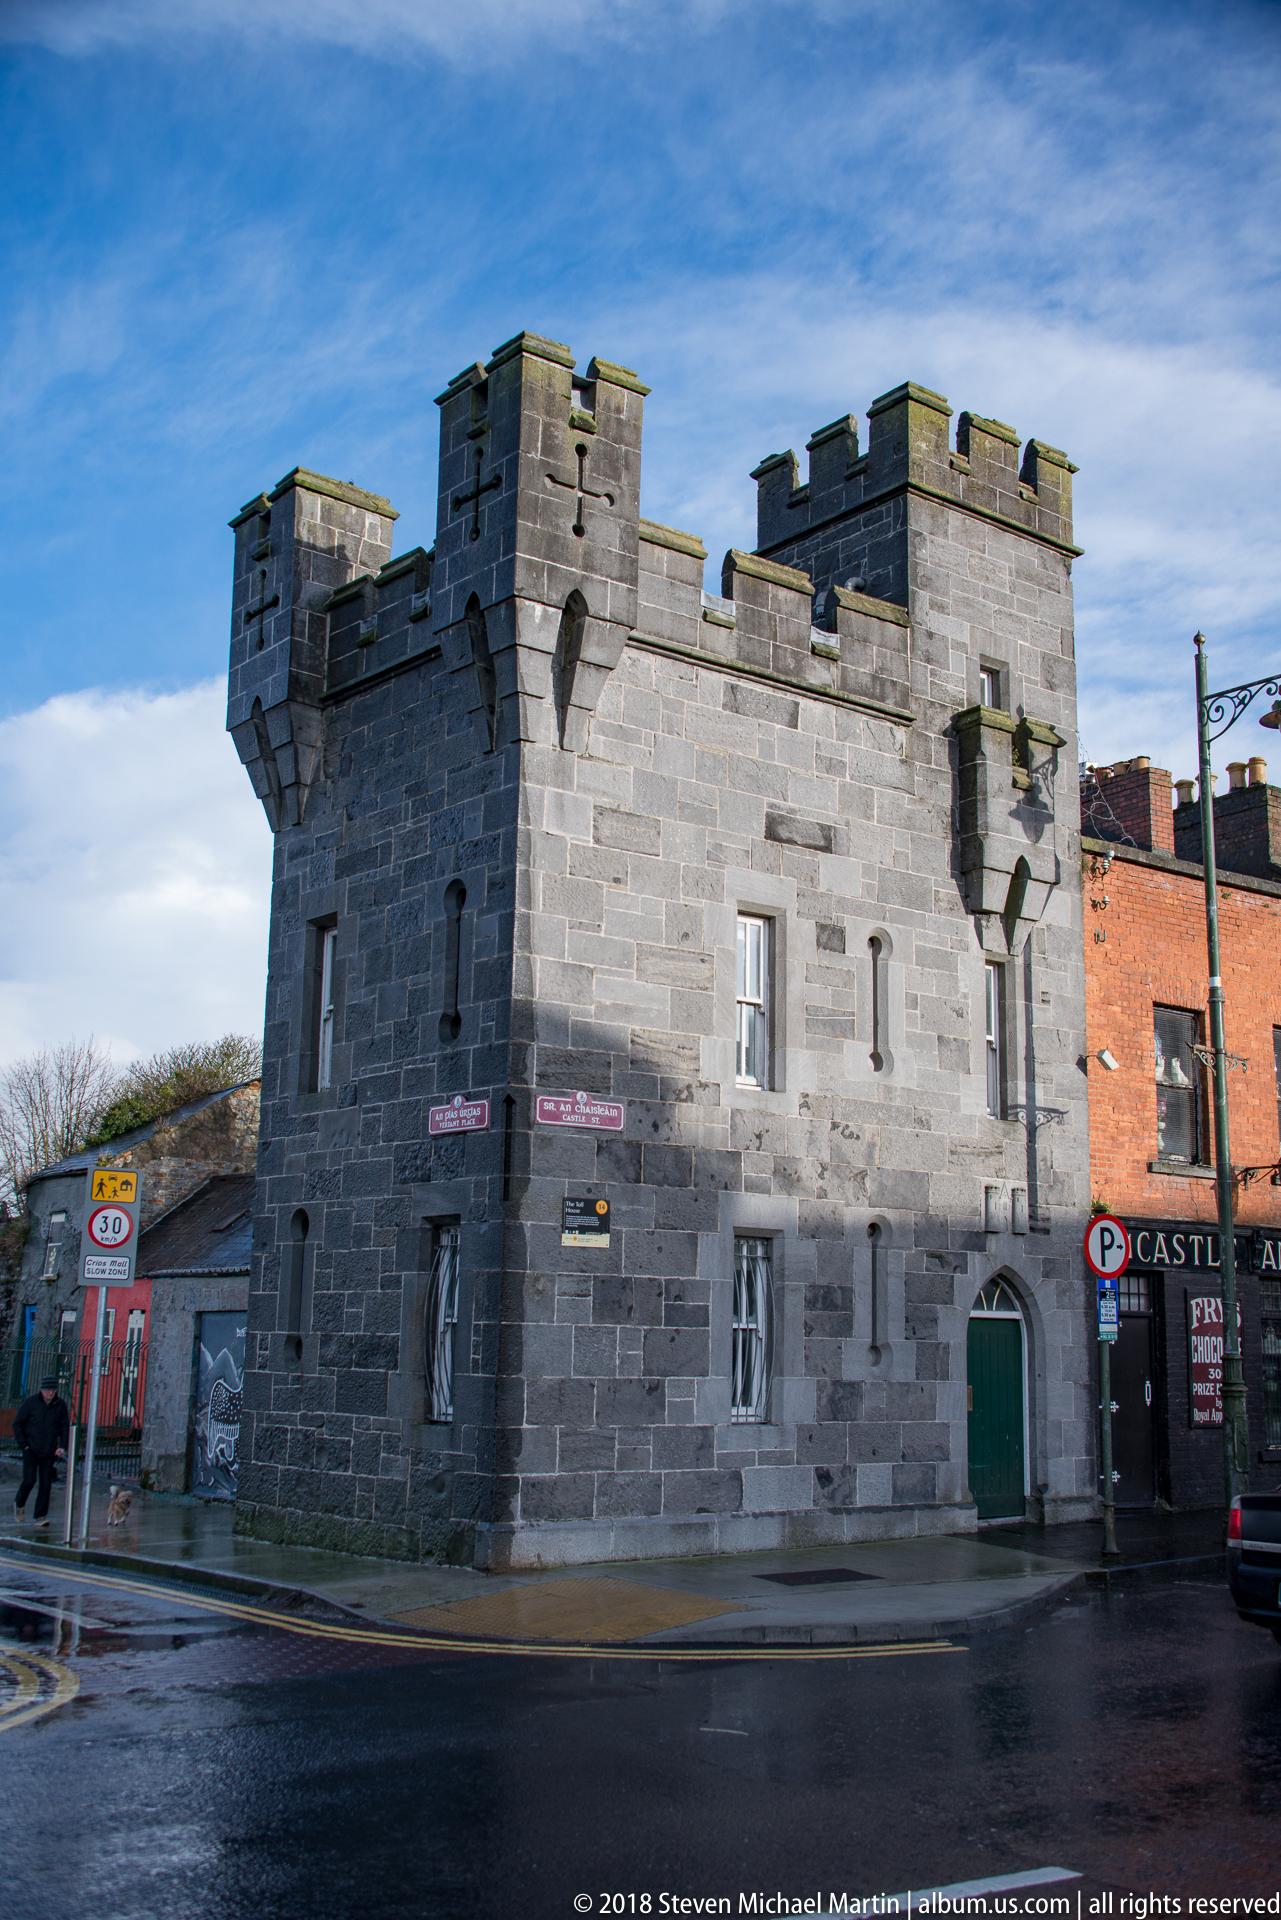 SMartin_2018 Ireland St. John's Castle (6 of 13)